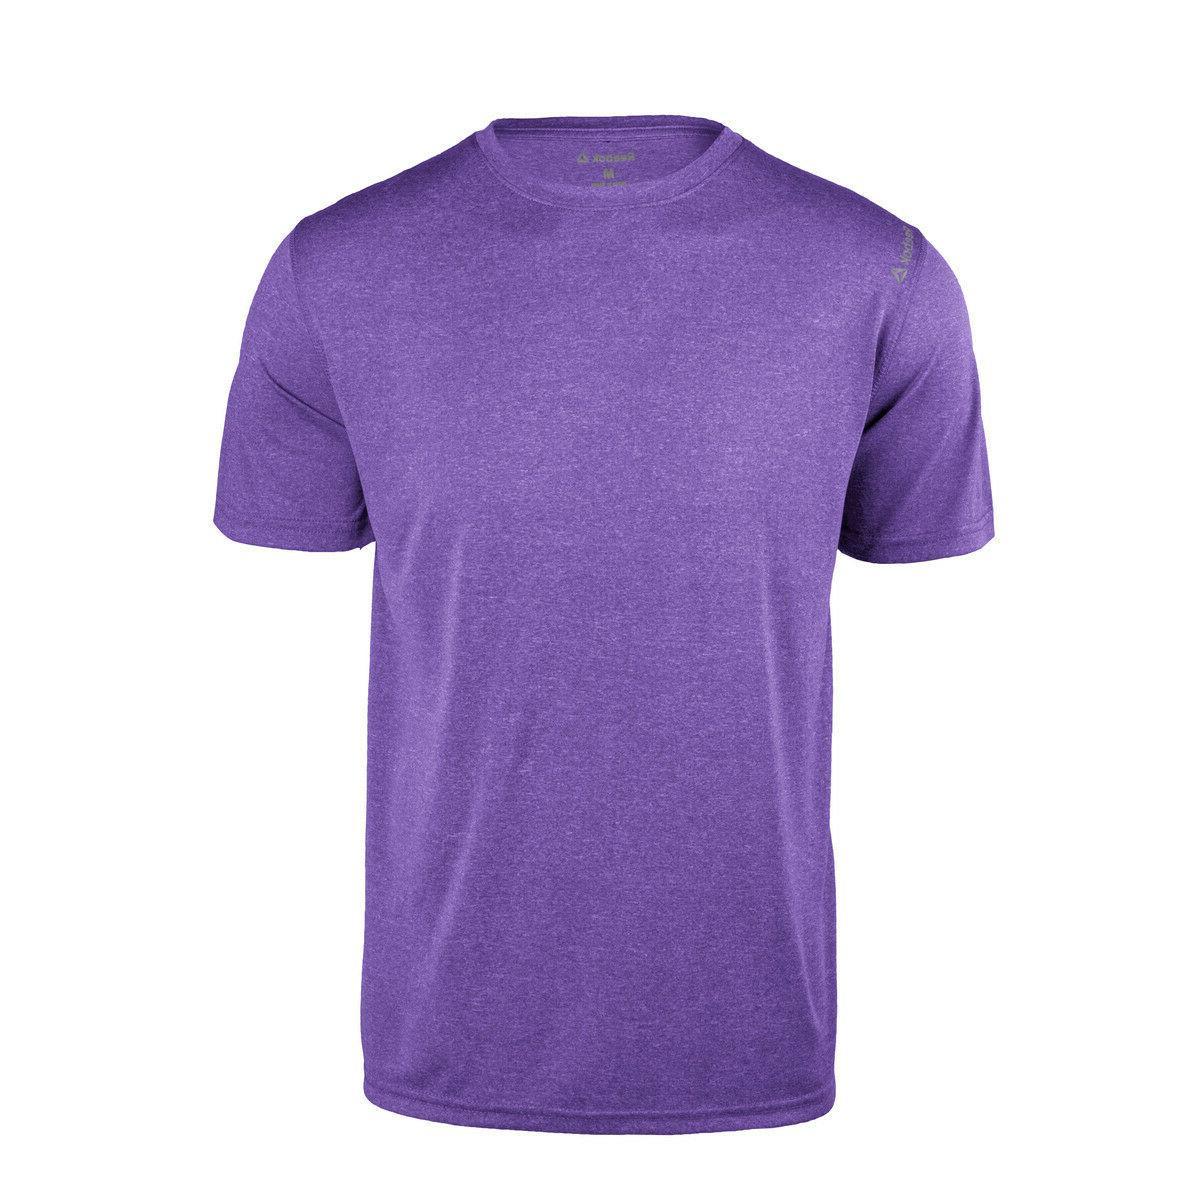 Reebok Mens dri-fit T-shirt out